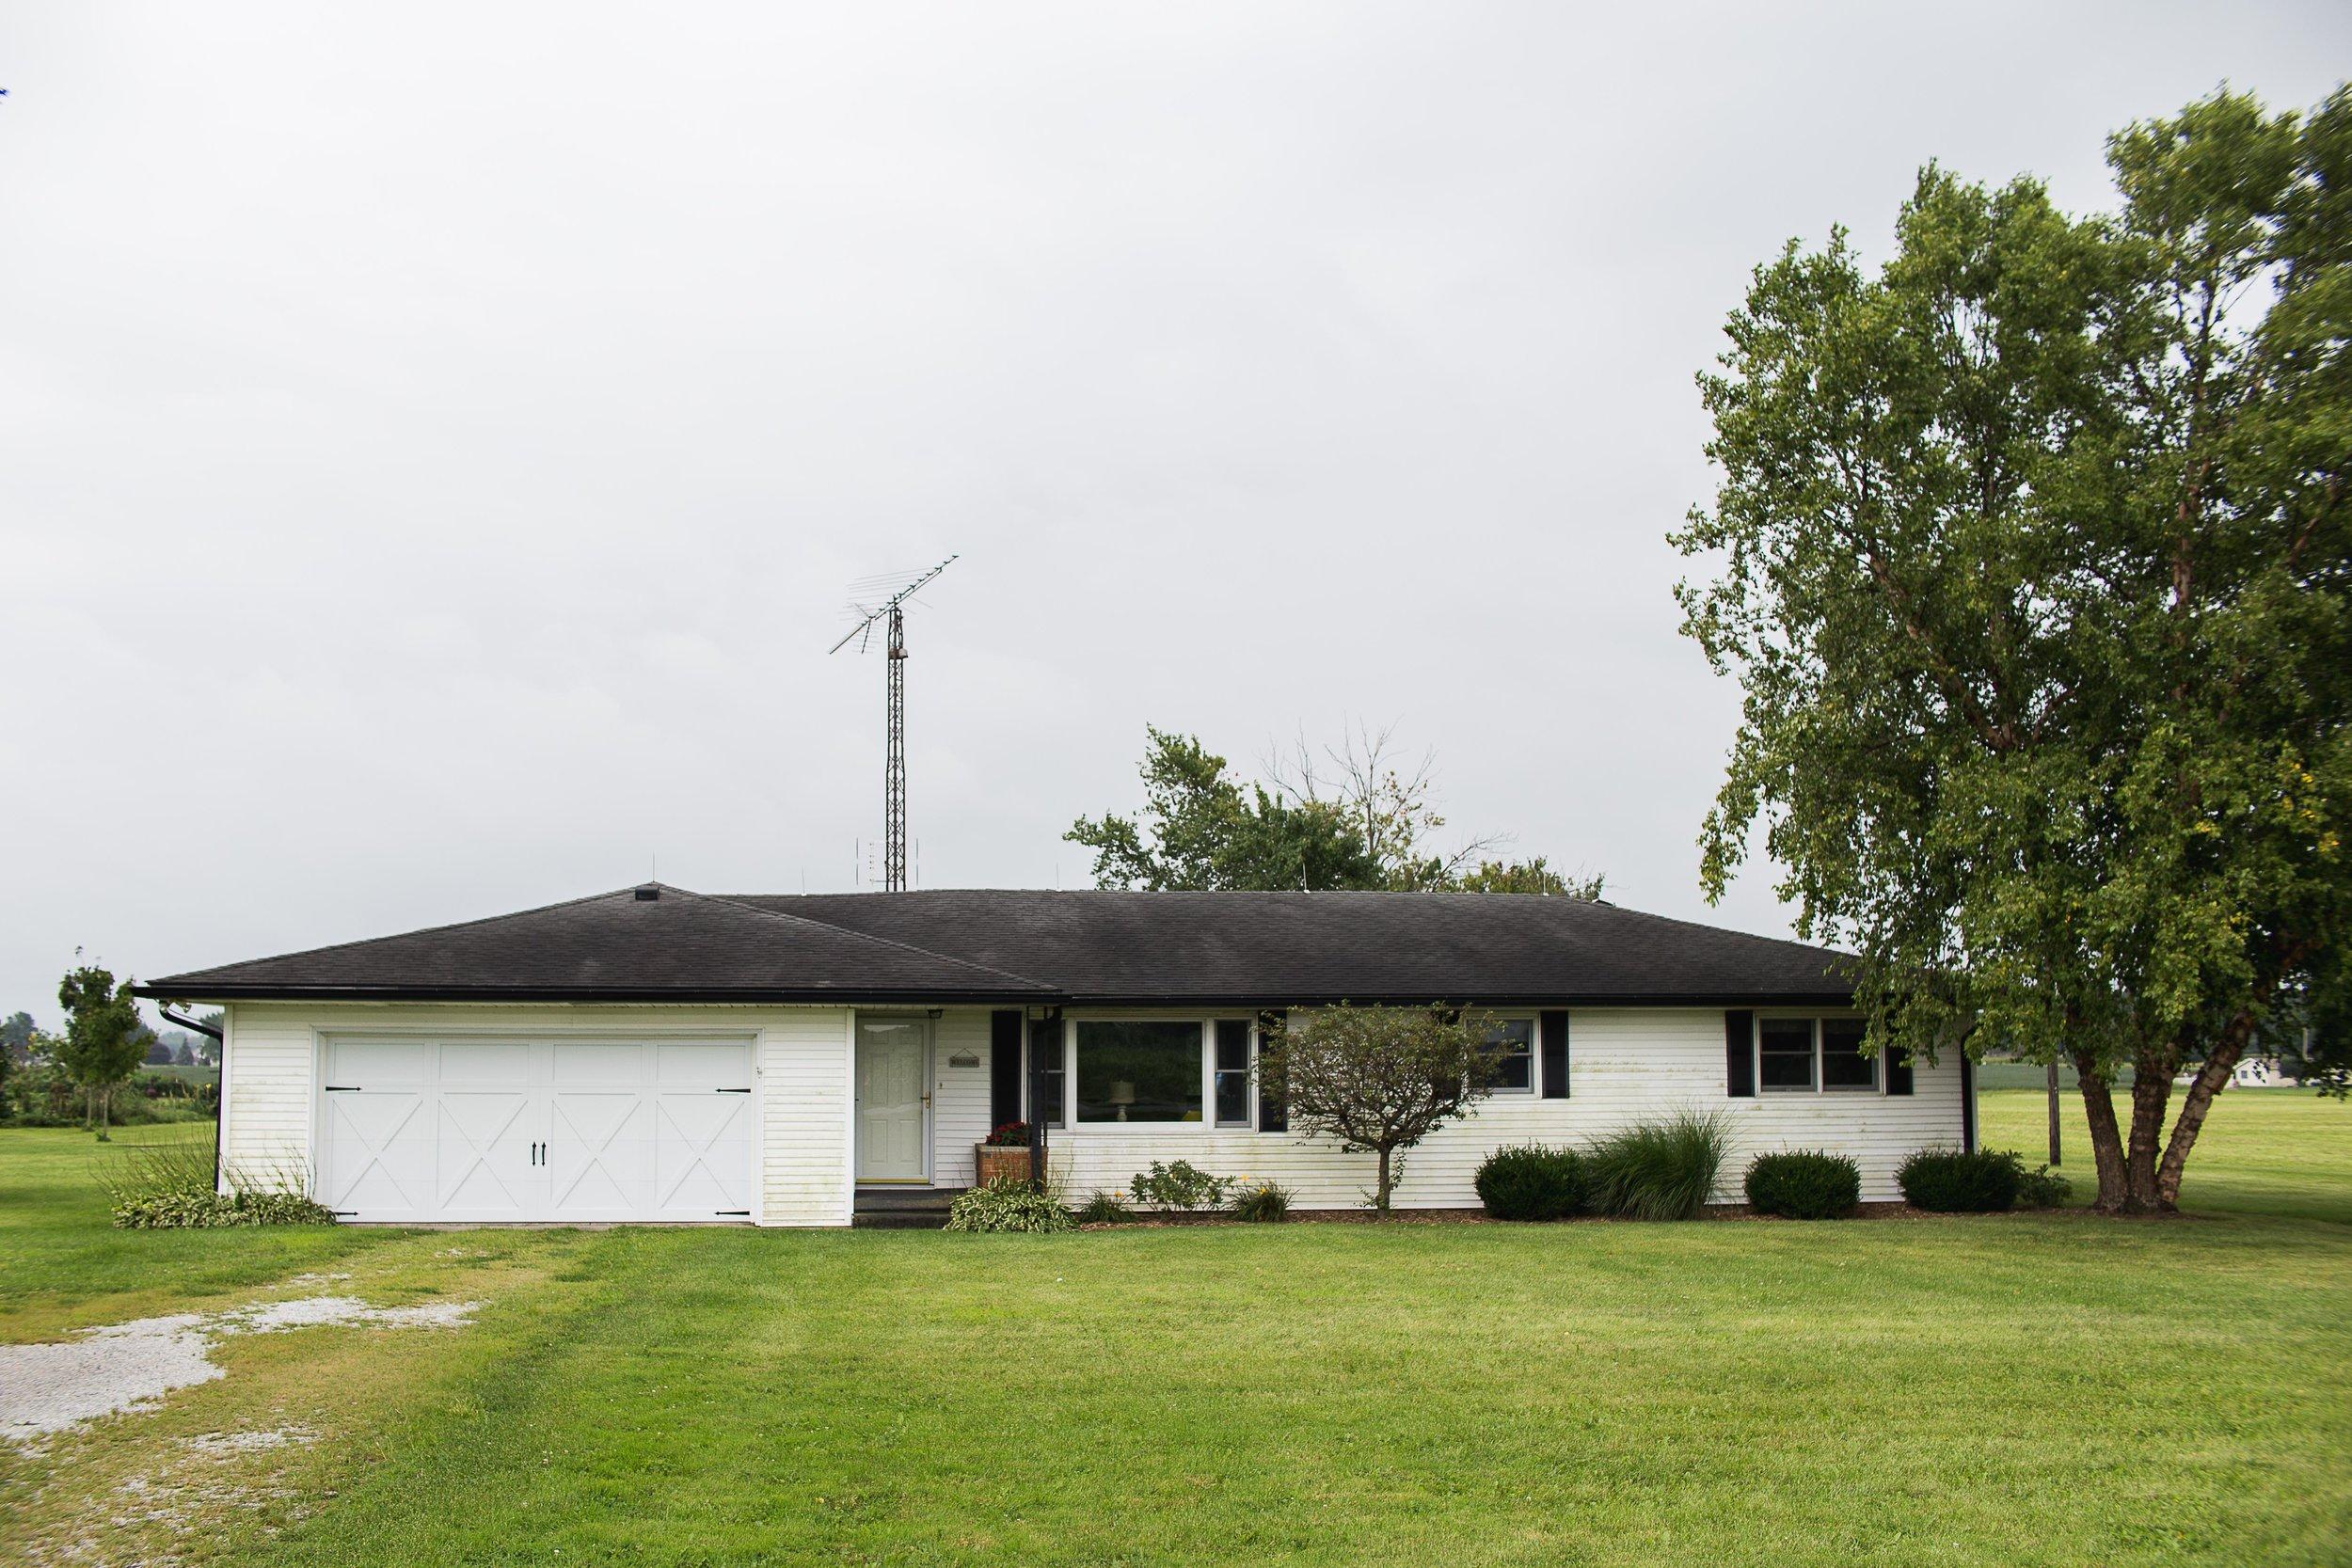 2018.8.13 Cottage-1.jpg